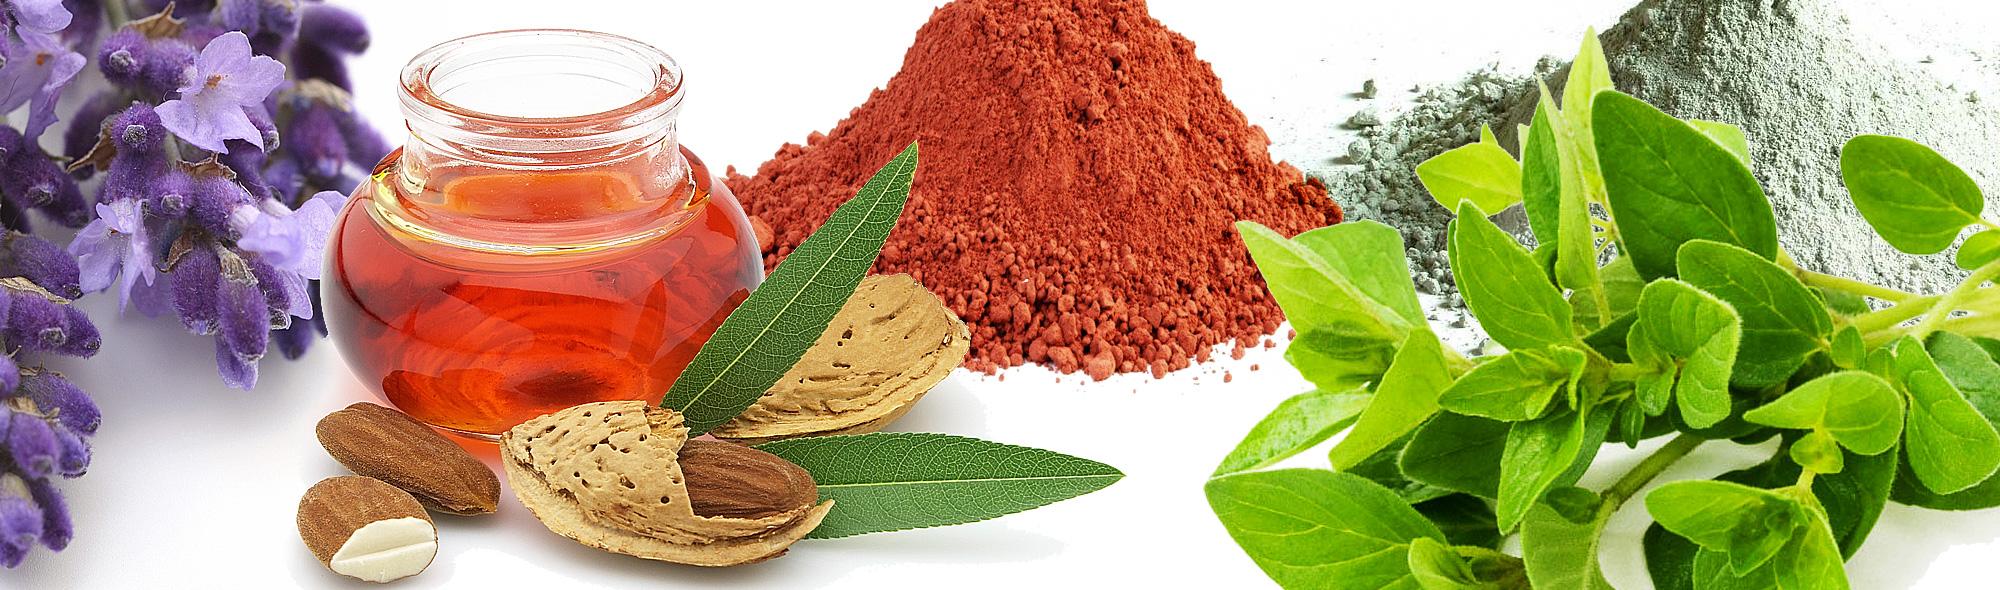 Antioxidantes y Conservantes